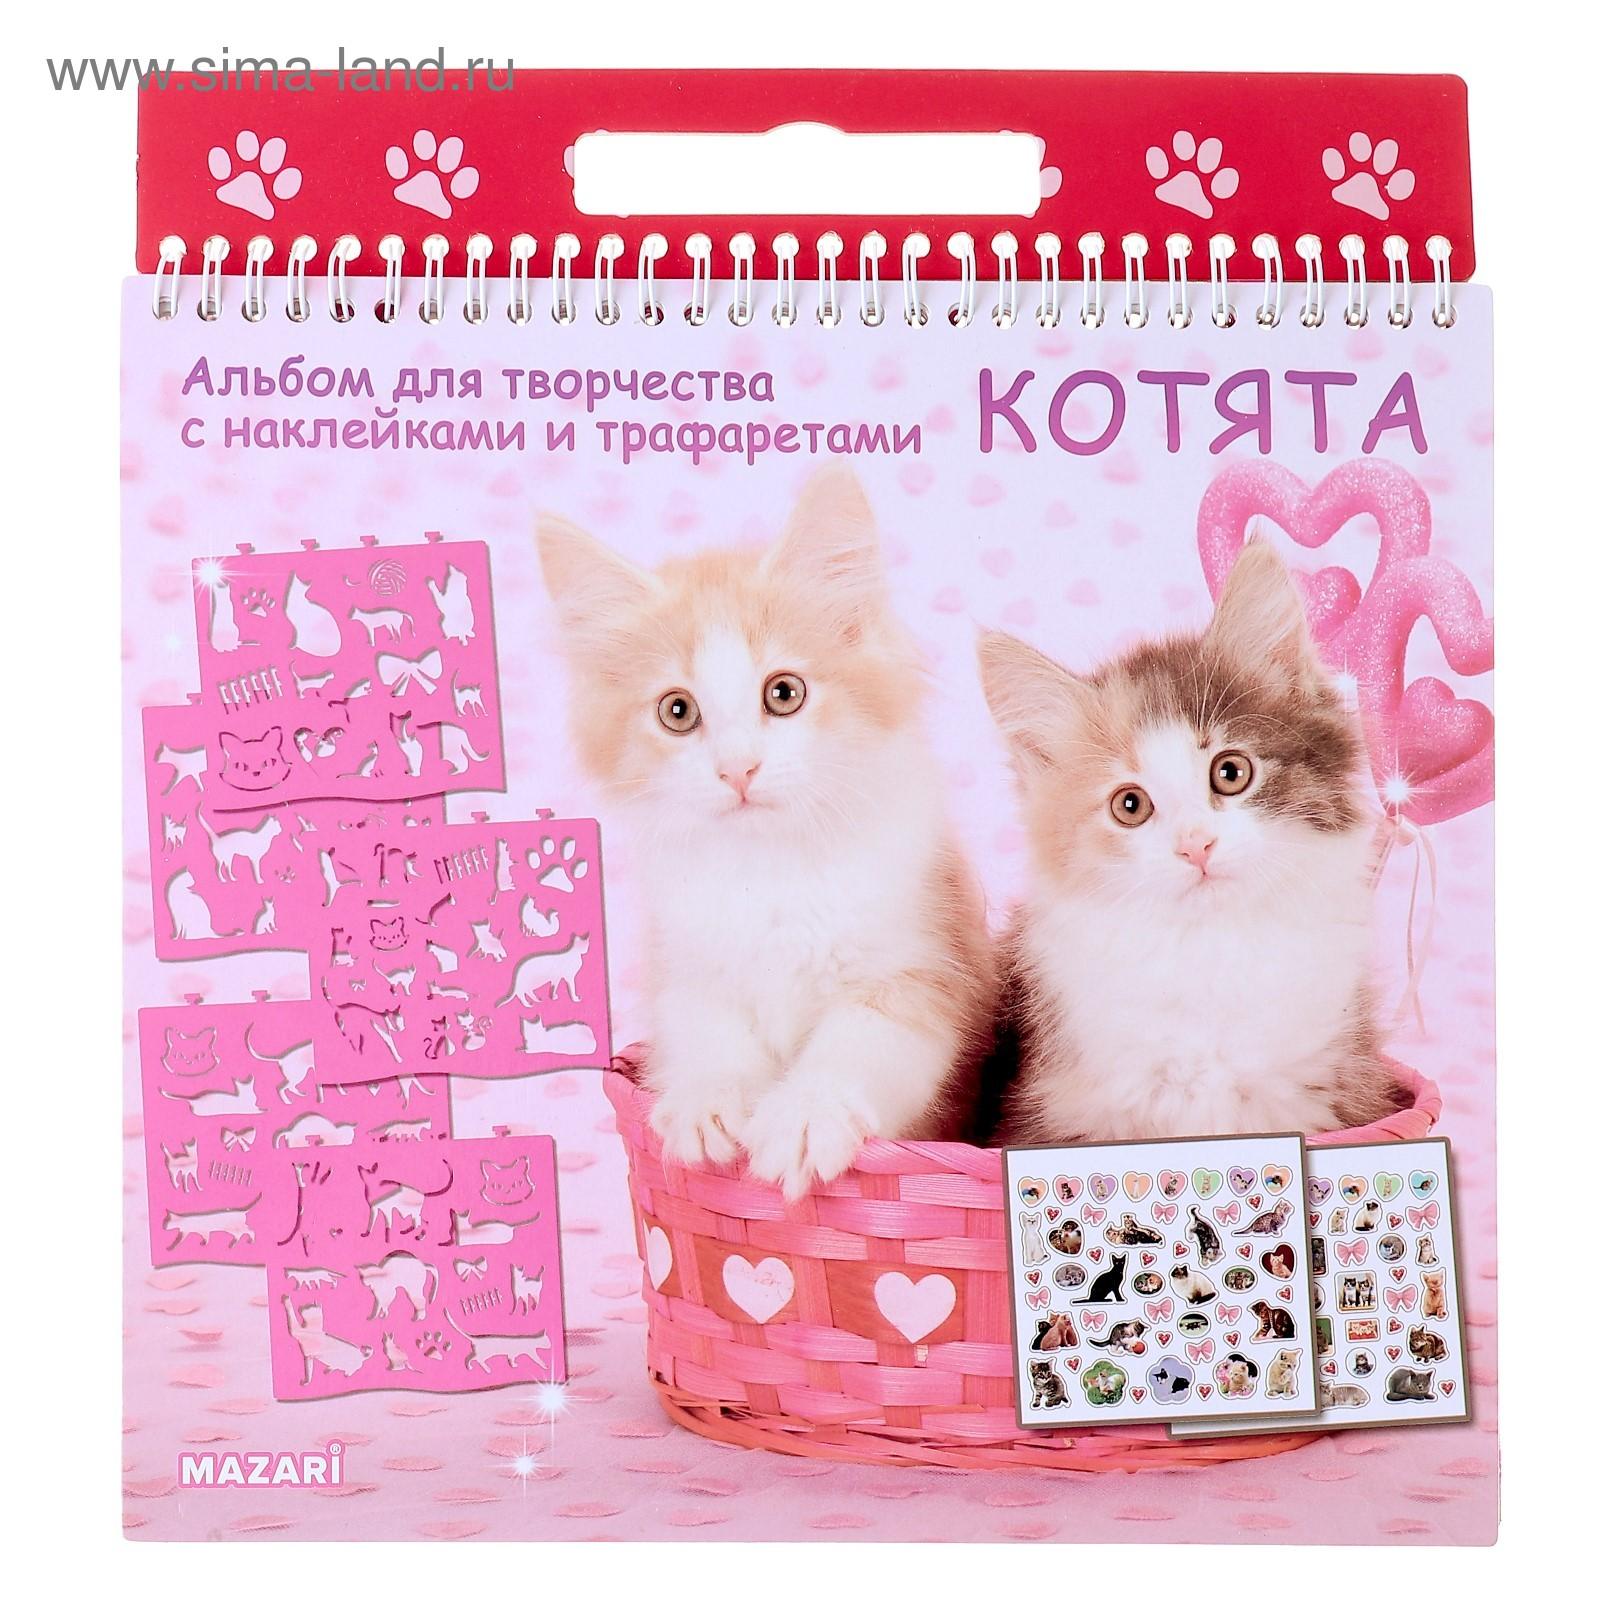 альбом для творчества котята с наклейками и трафаретами